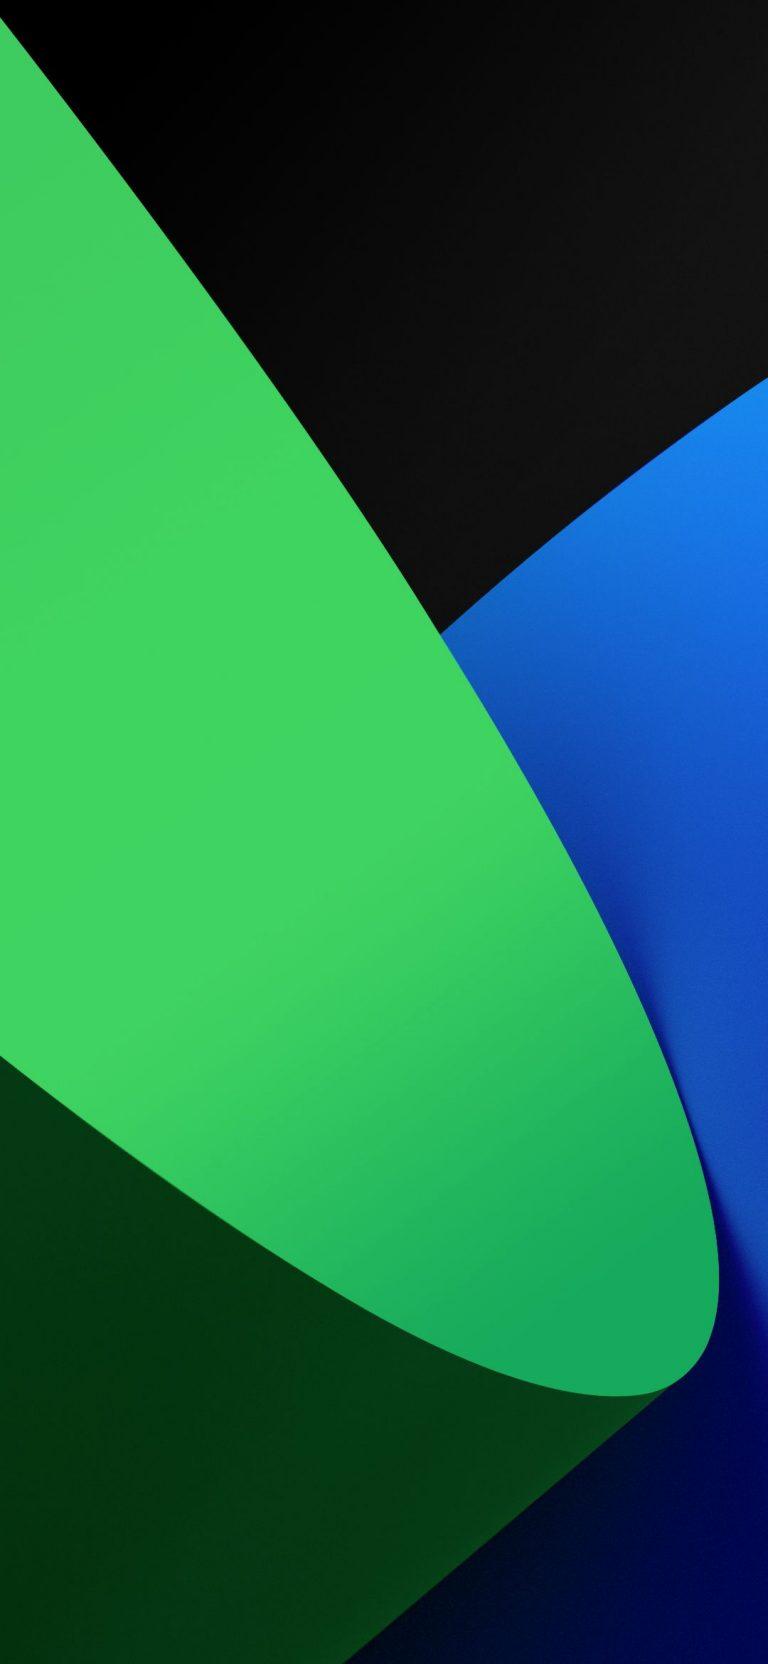 Realme Narzo 10 Wallpaper [1080x2340] - 02